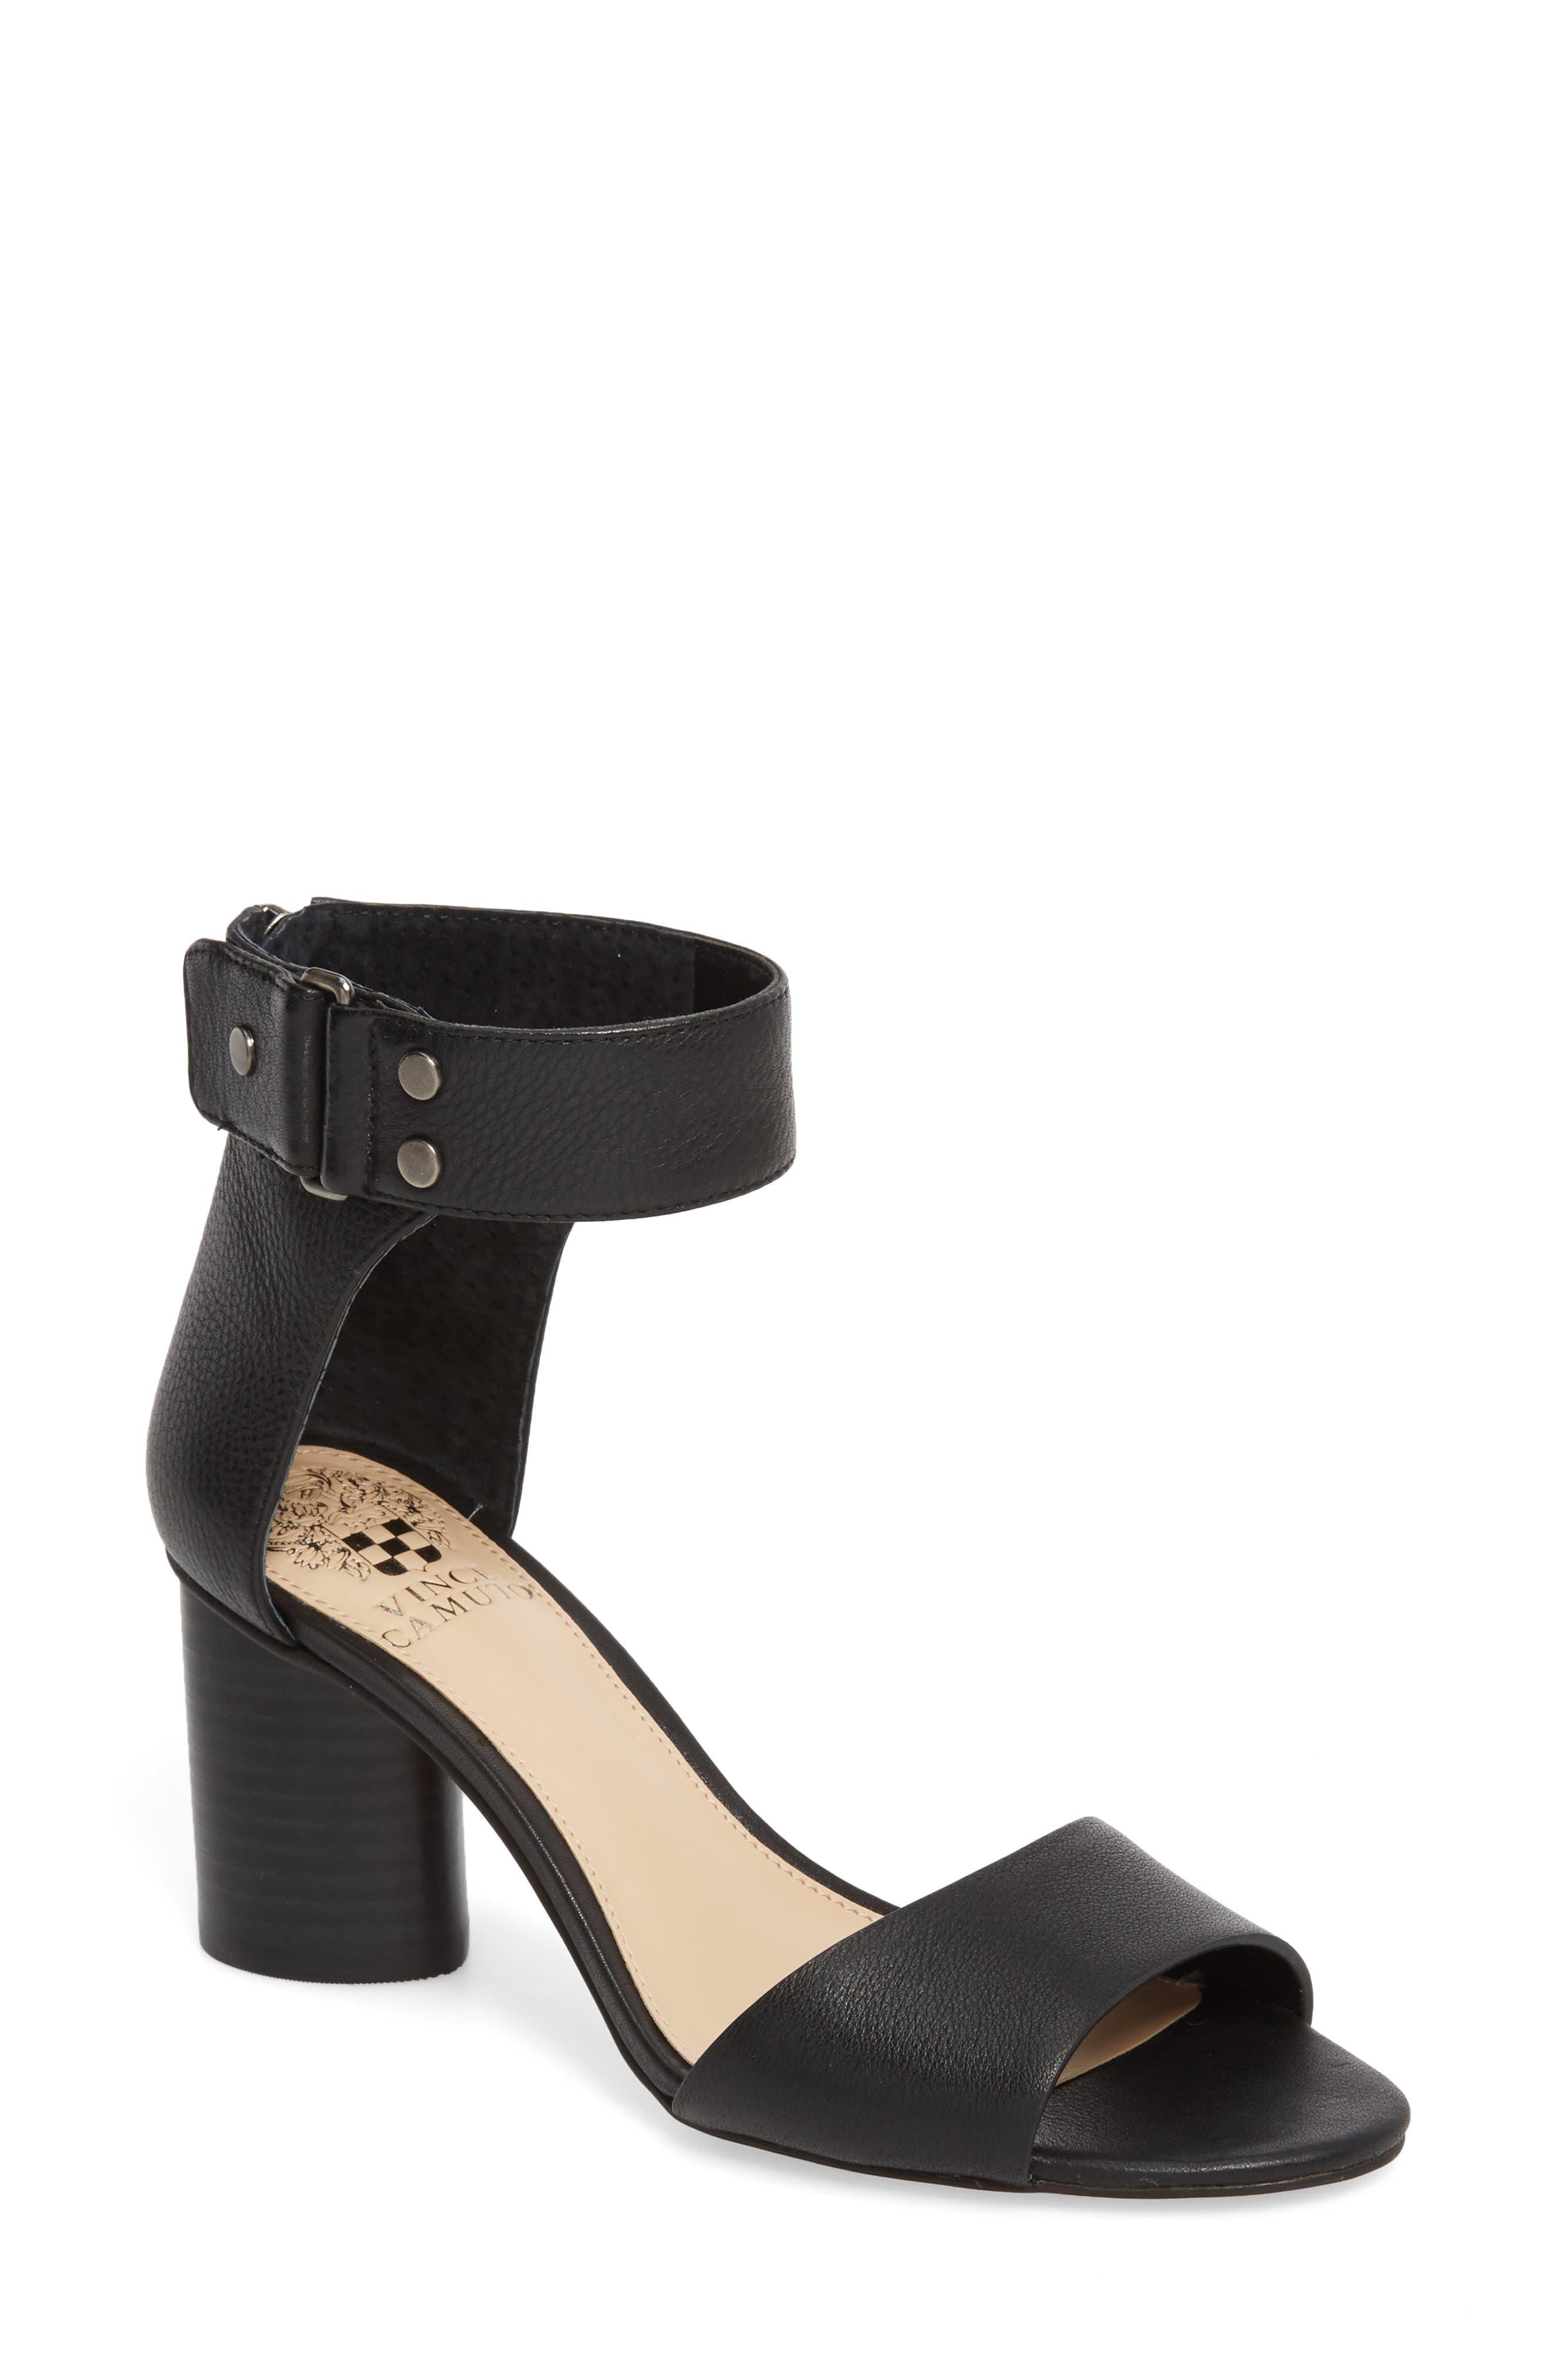 Jannali Ankle Strap Sandal,                             Main thumbnail 1, color,                             BLACK LEATHER